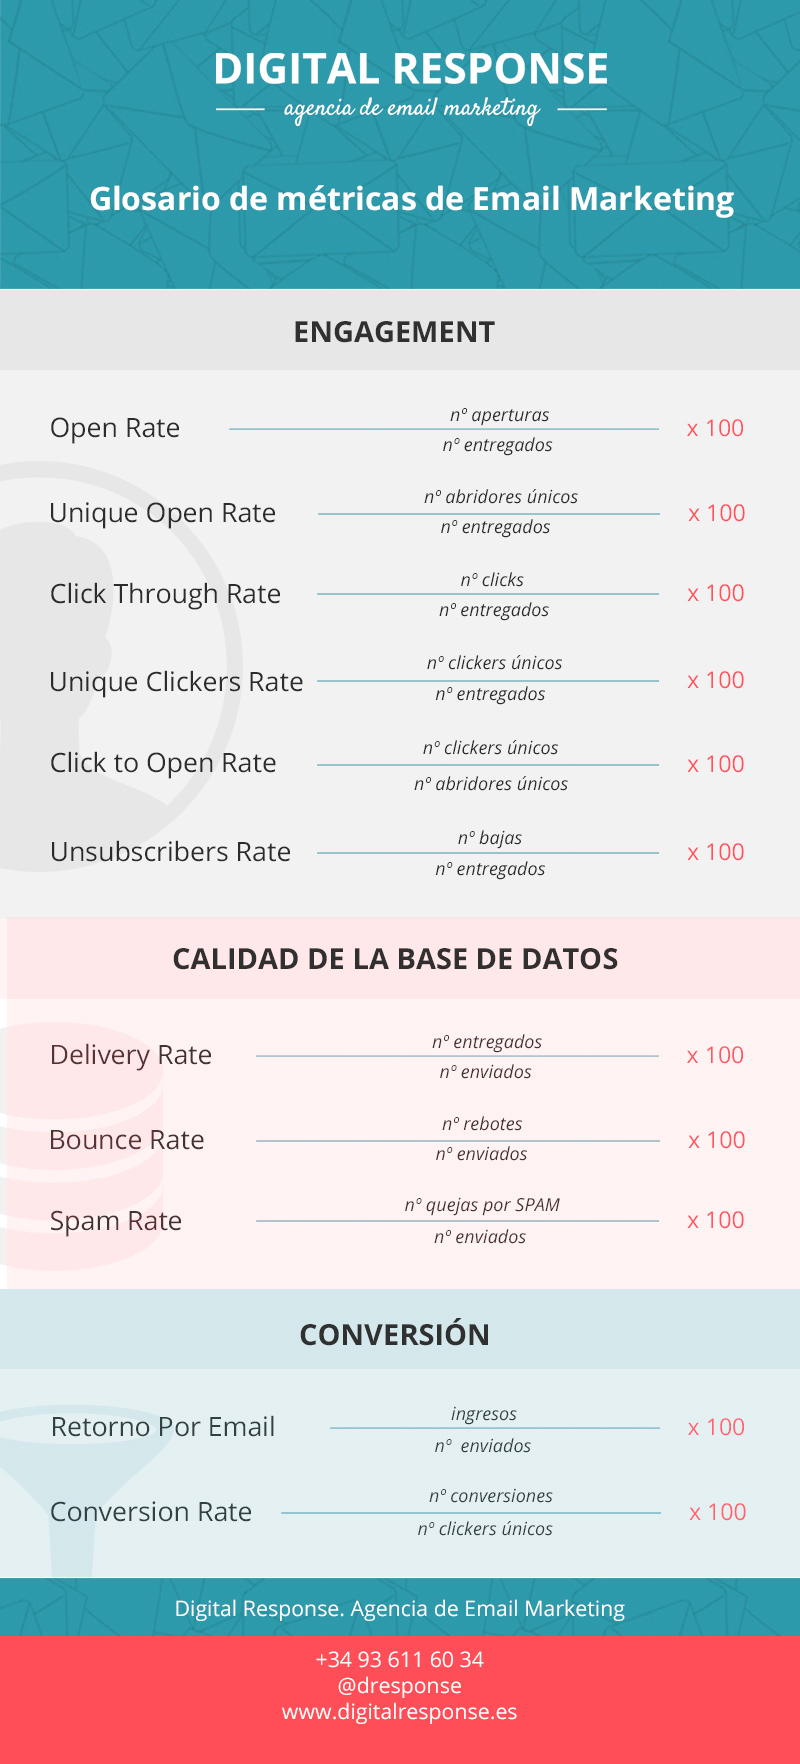 infografia_glosario_Digital Response